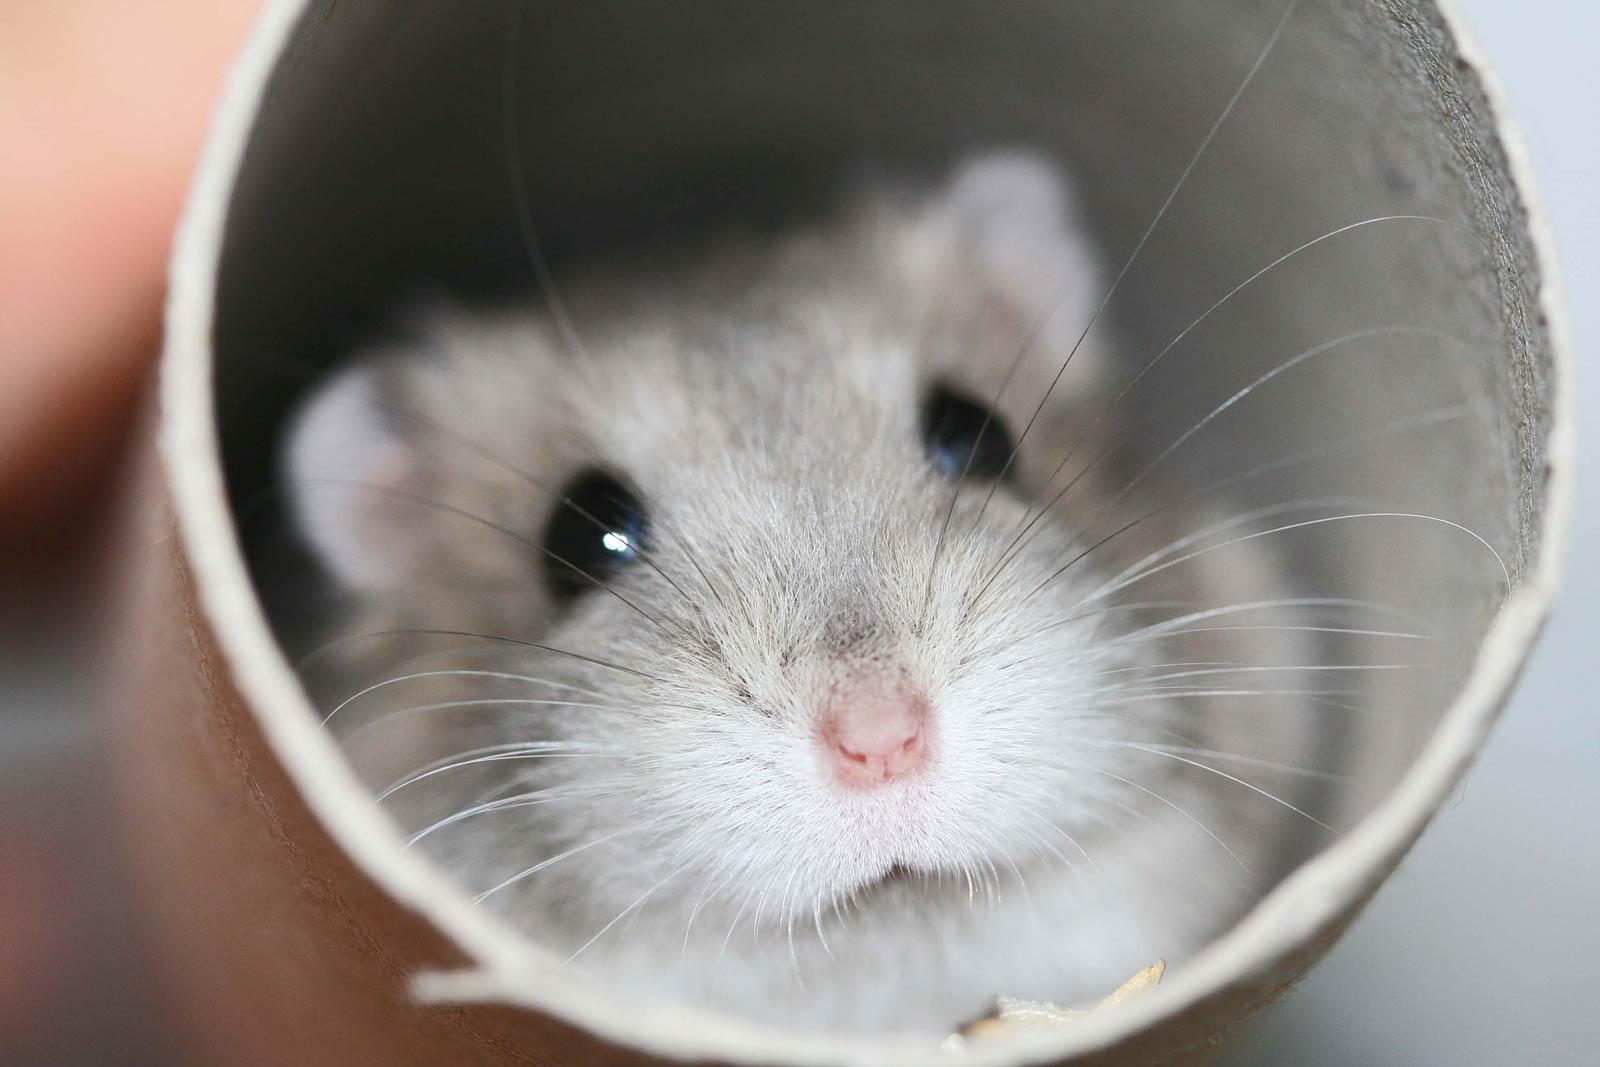 Hamster free p***